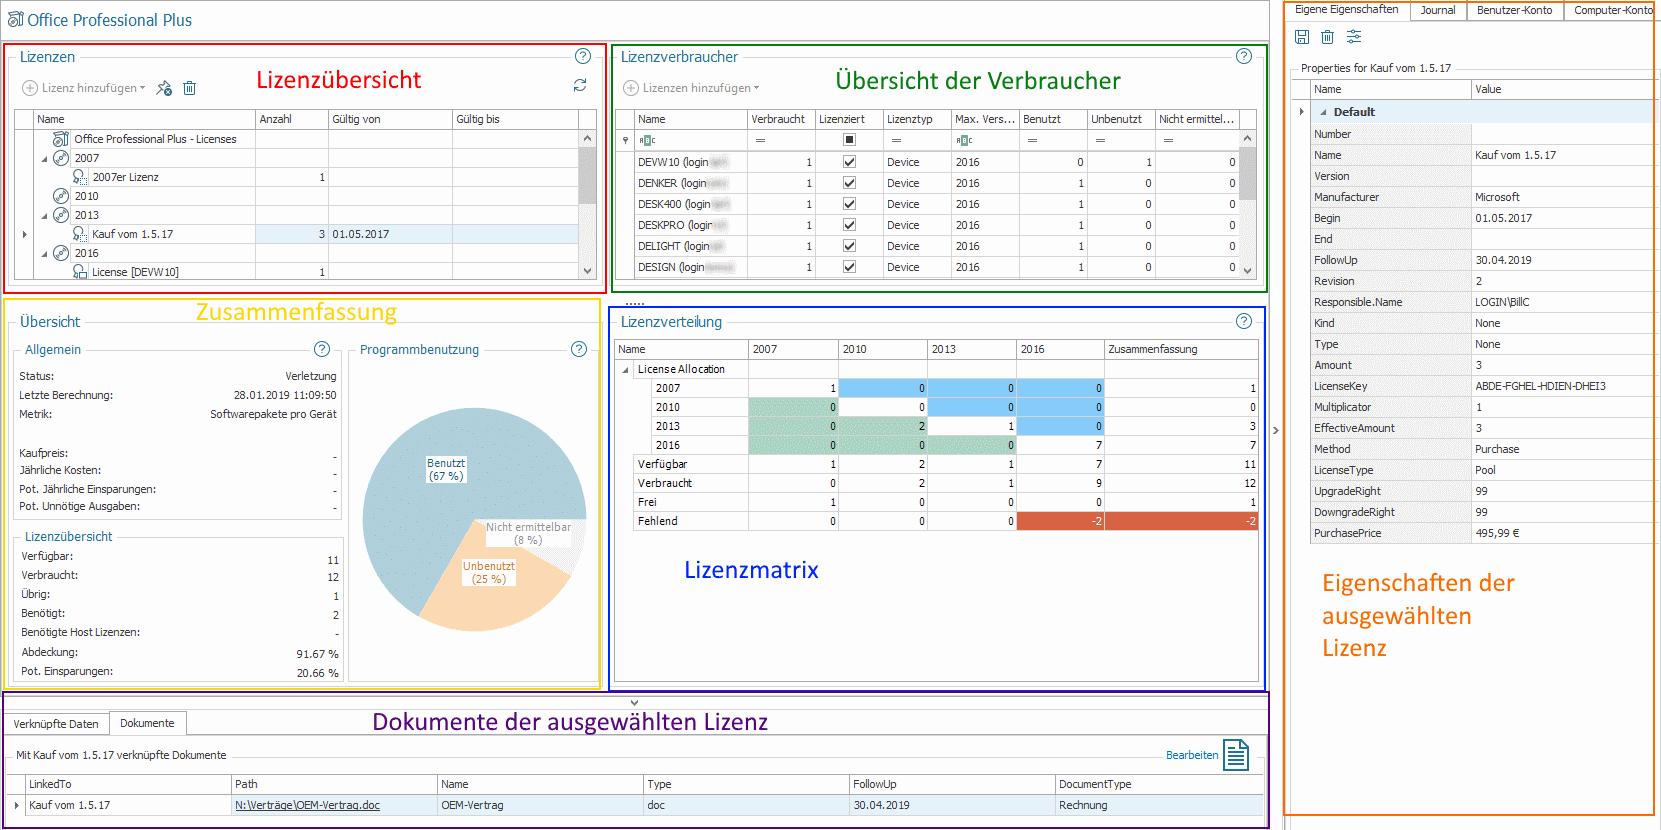 Produkt-Details im Lizenzmanagement